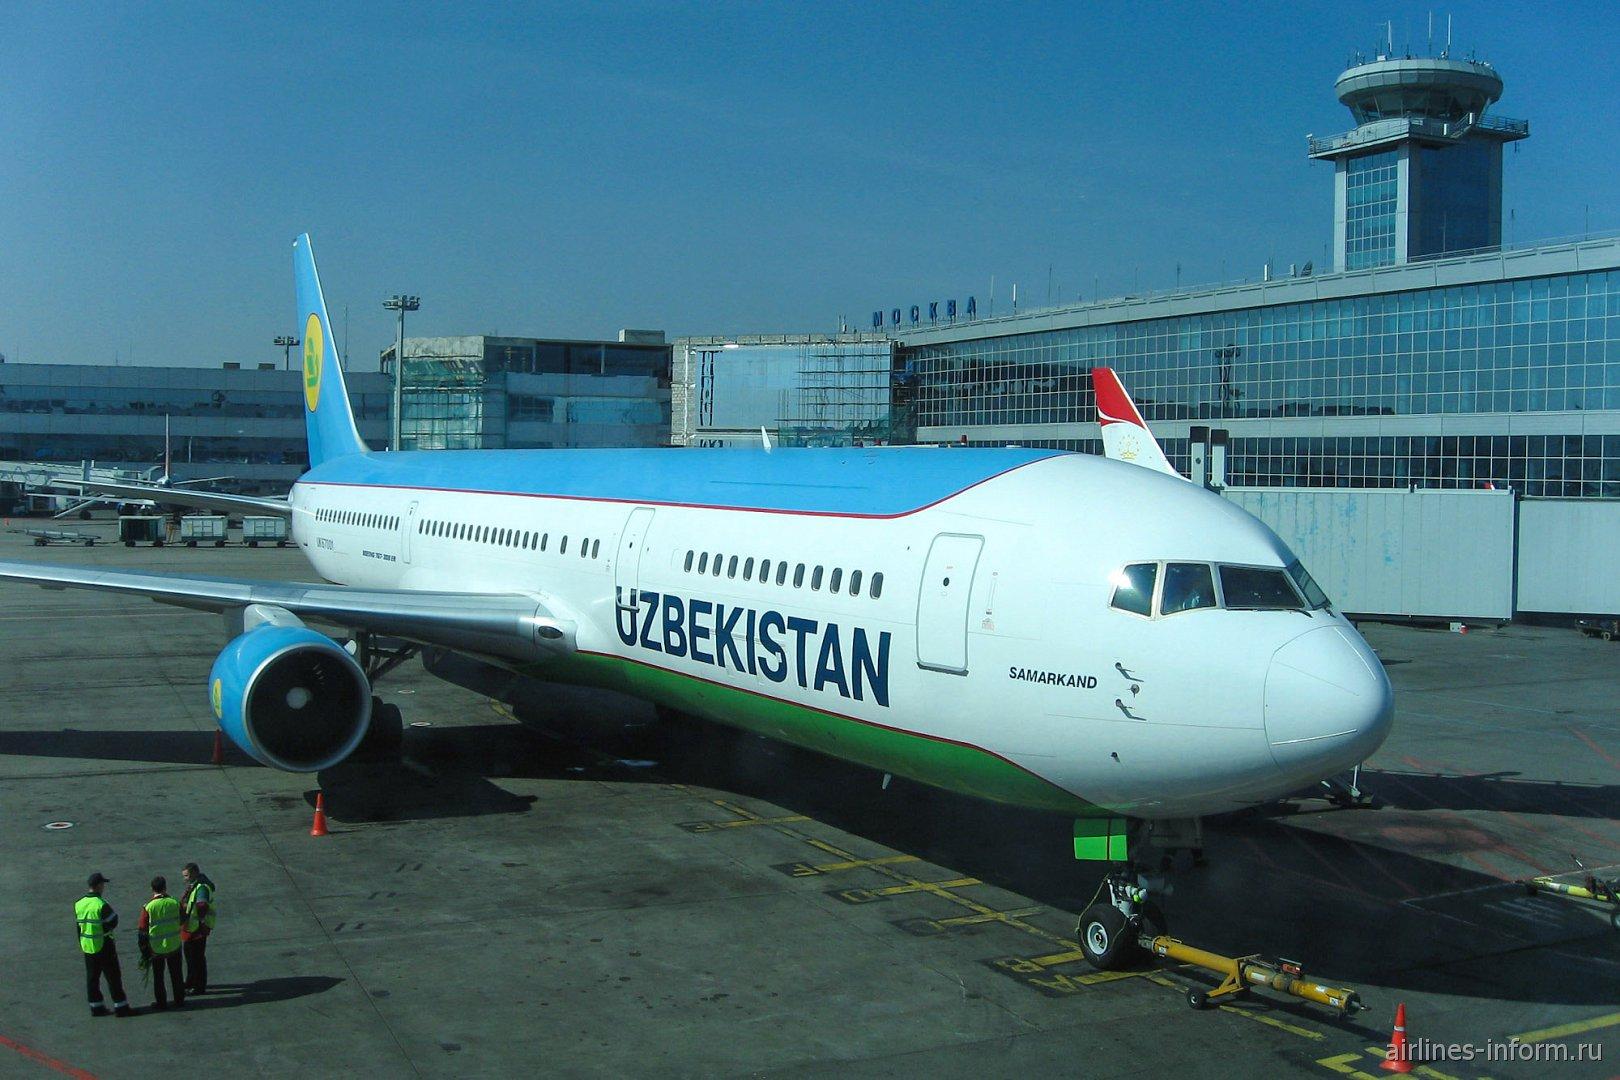 Боинг-767-300 Узбекских авиалиний в аэропорту Домодедово